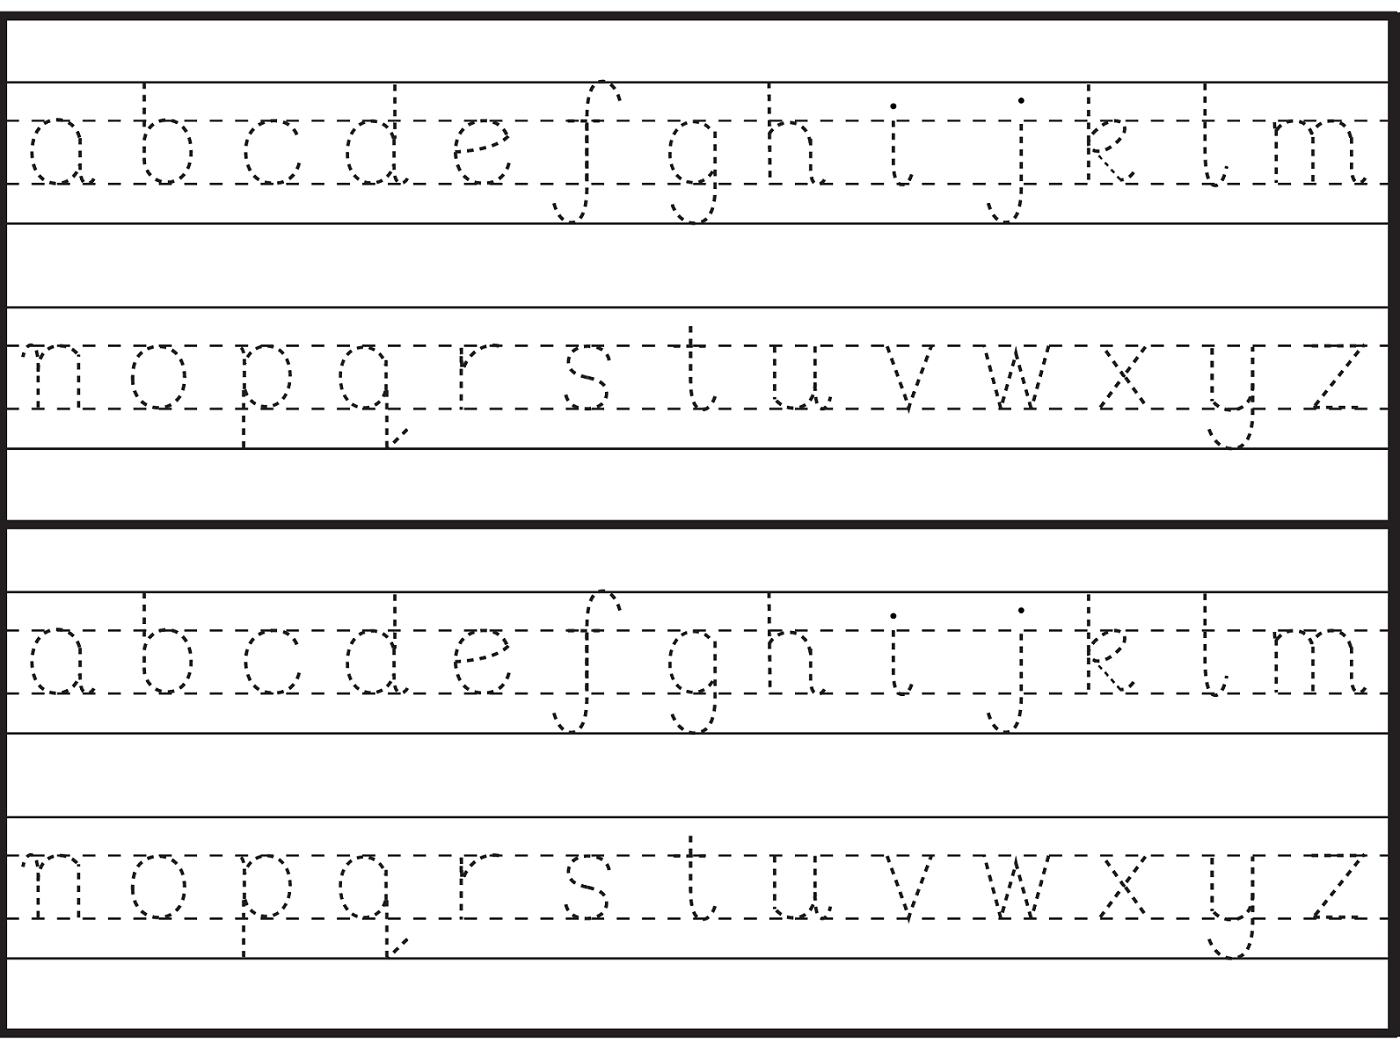 English Alphabet Worksheet For Kindergarten   Letter Tracing inside English Letters Tracing Worksheets